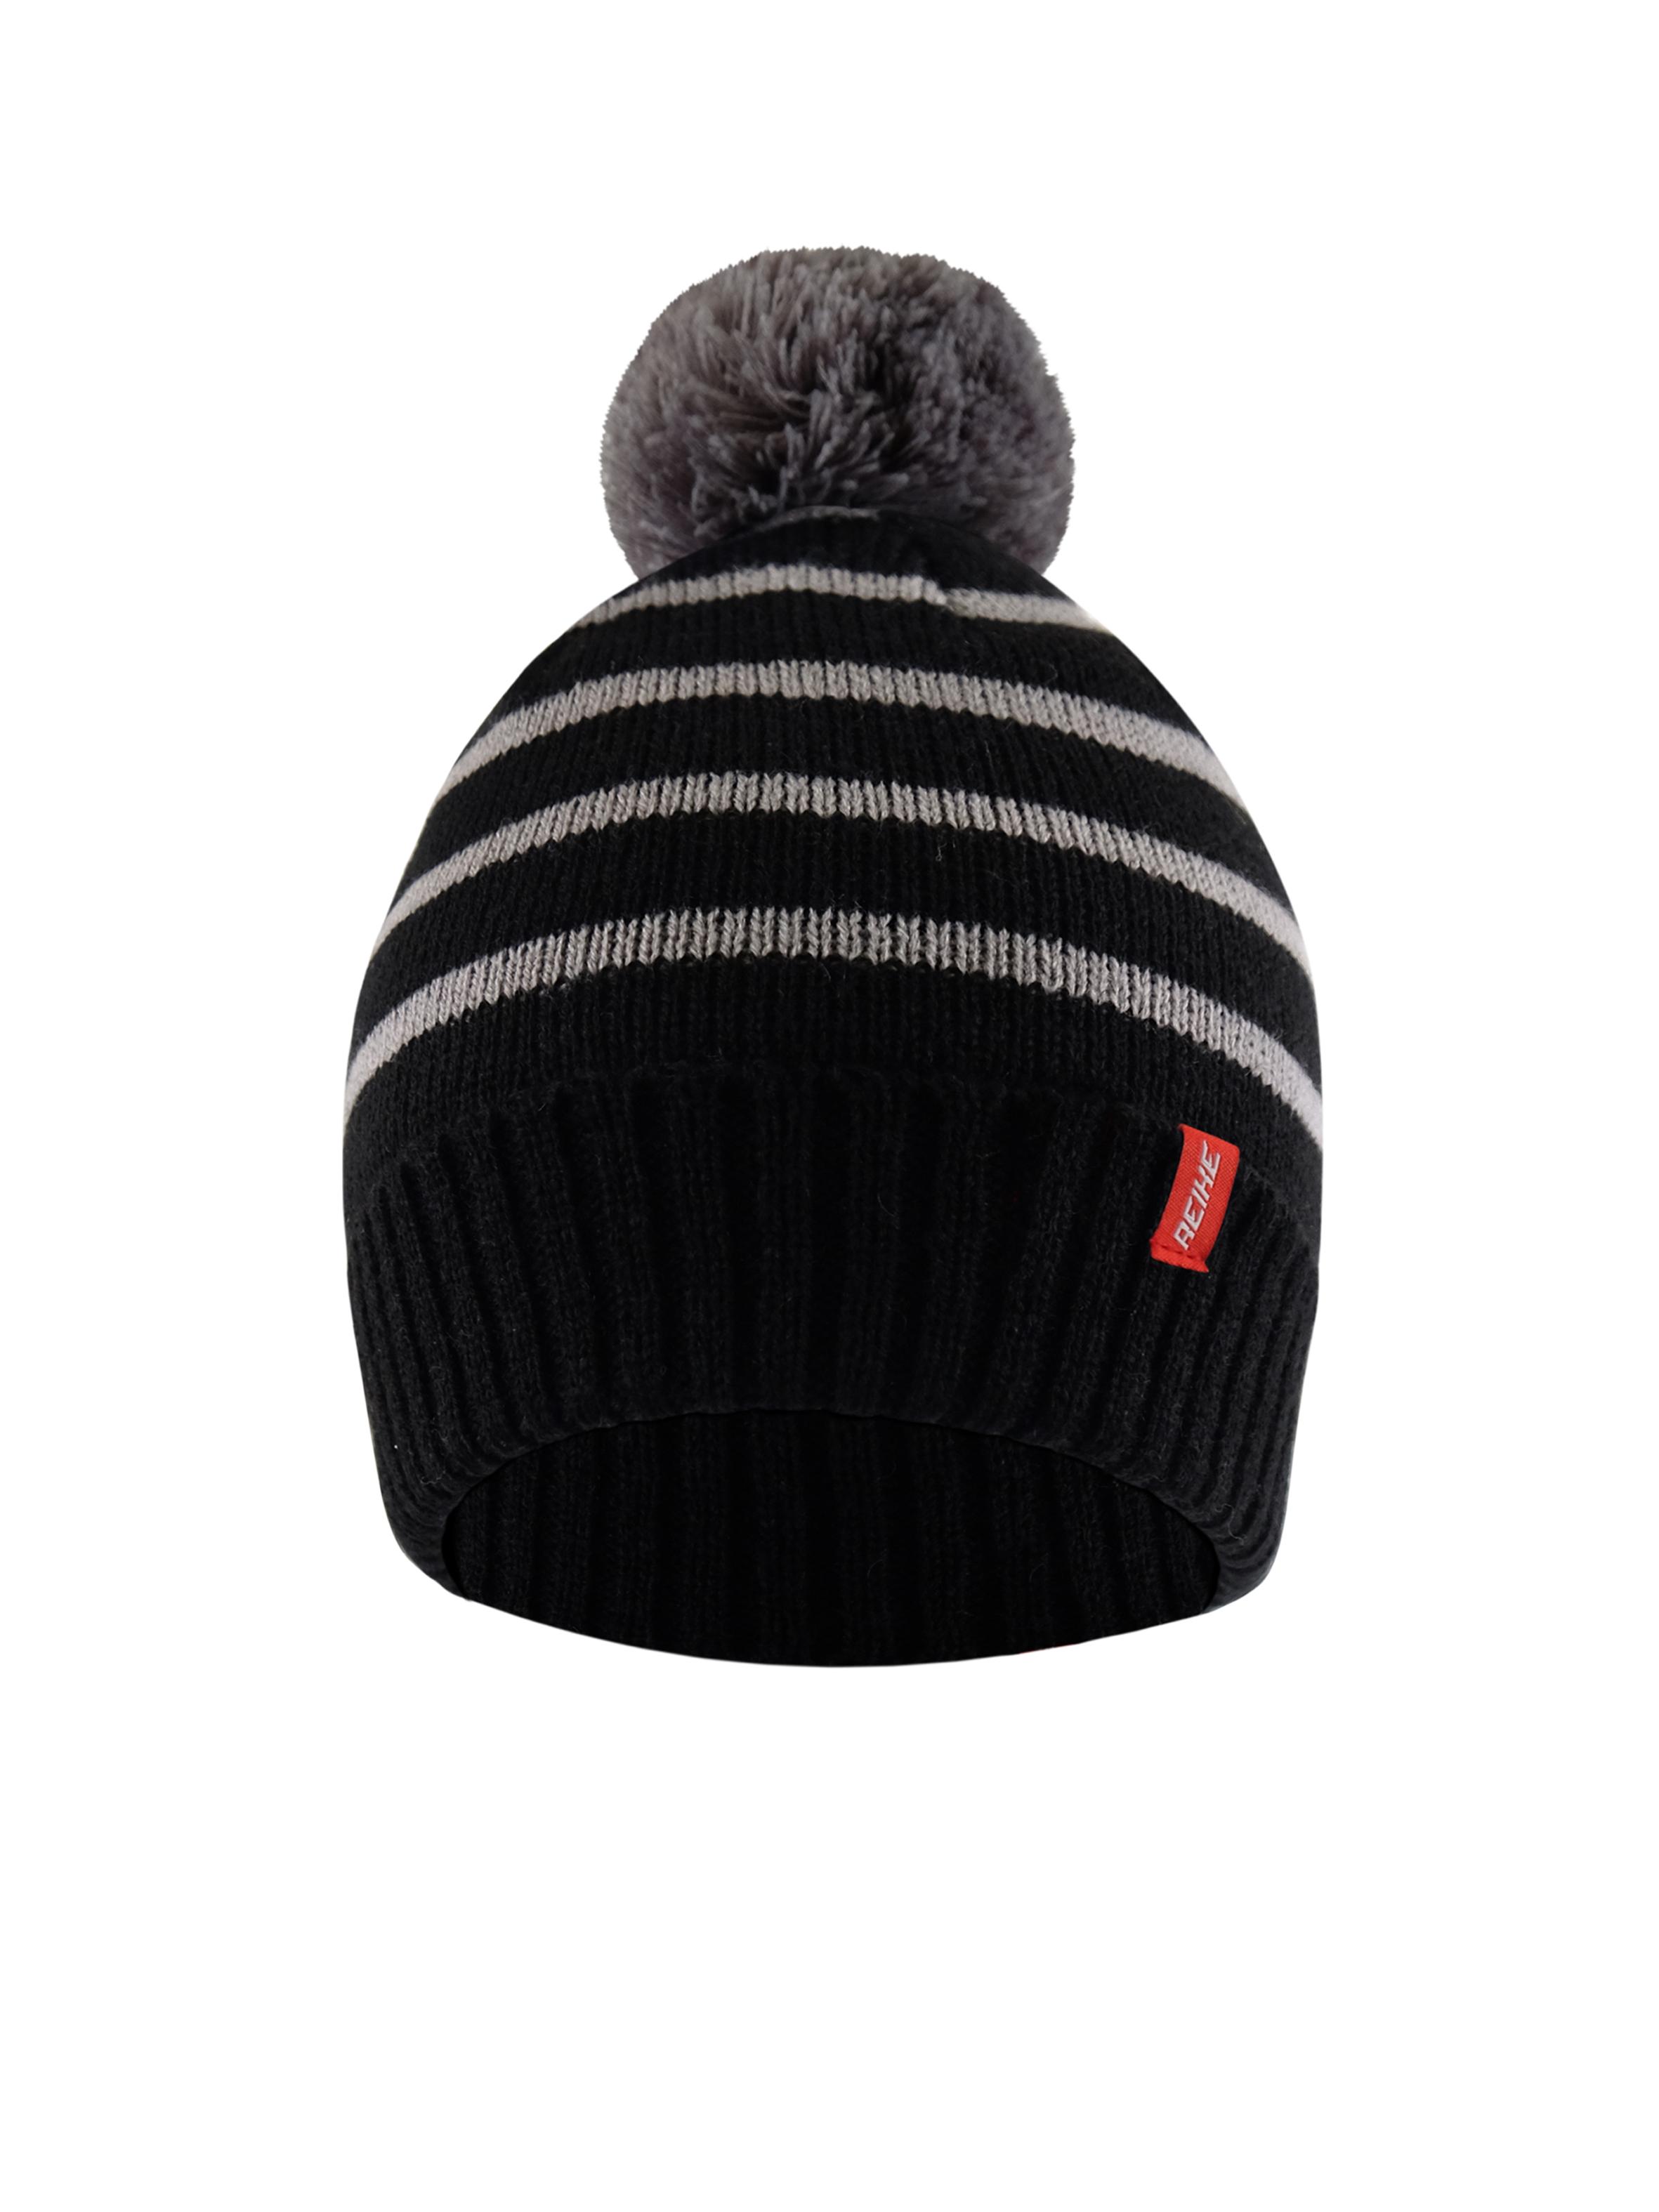 Купить Шапка для мальчика Reike GEO black, RKN2021-2 GEO black р.56, р.56,